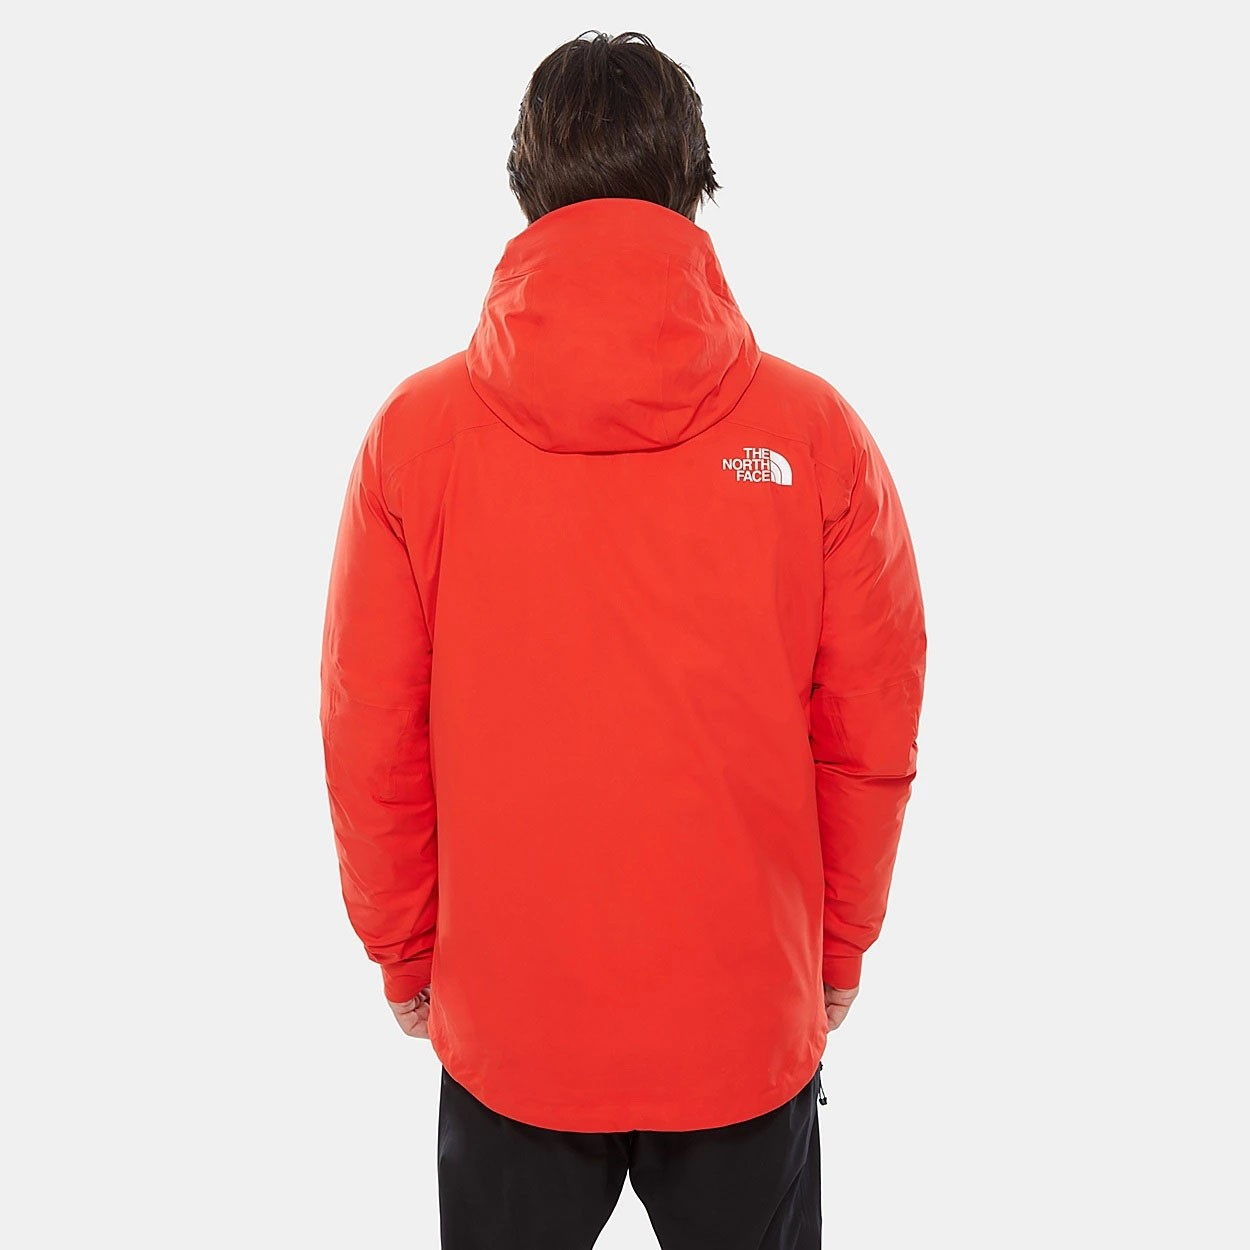 The North Face Summit L5 LT Waterproof Jacket - Men's - Fiery Red